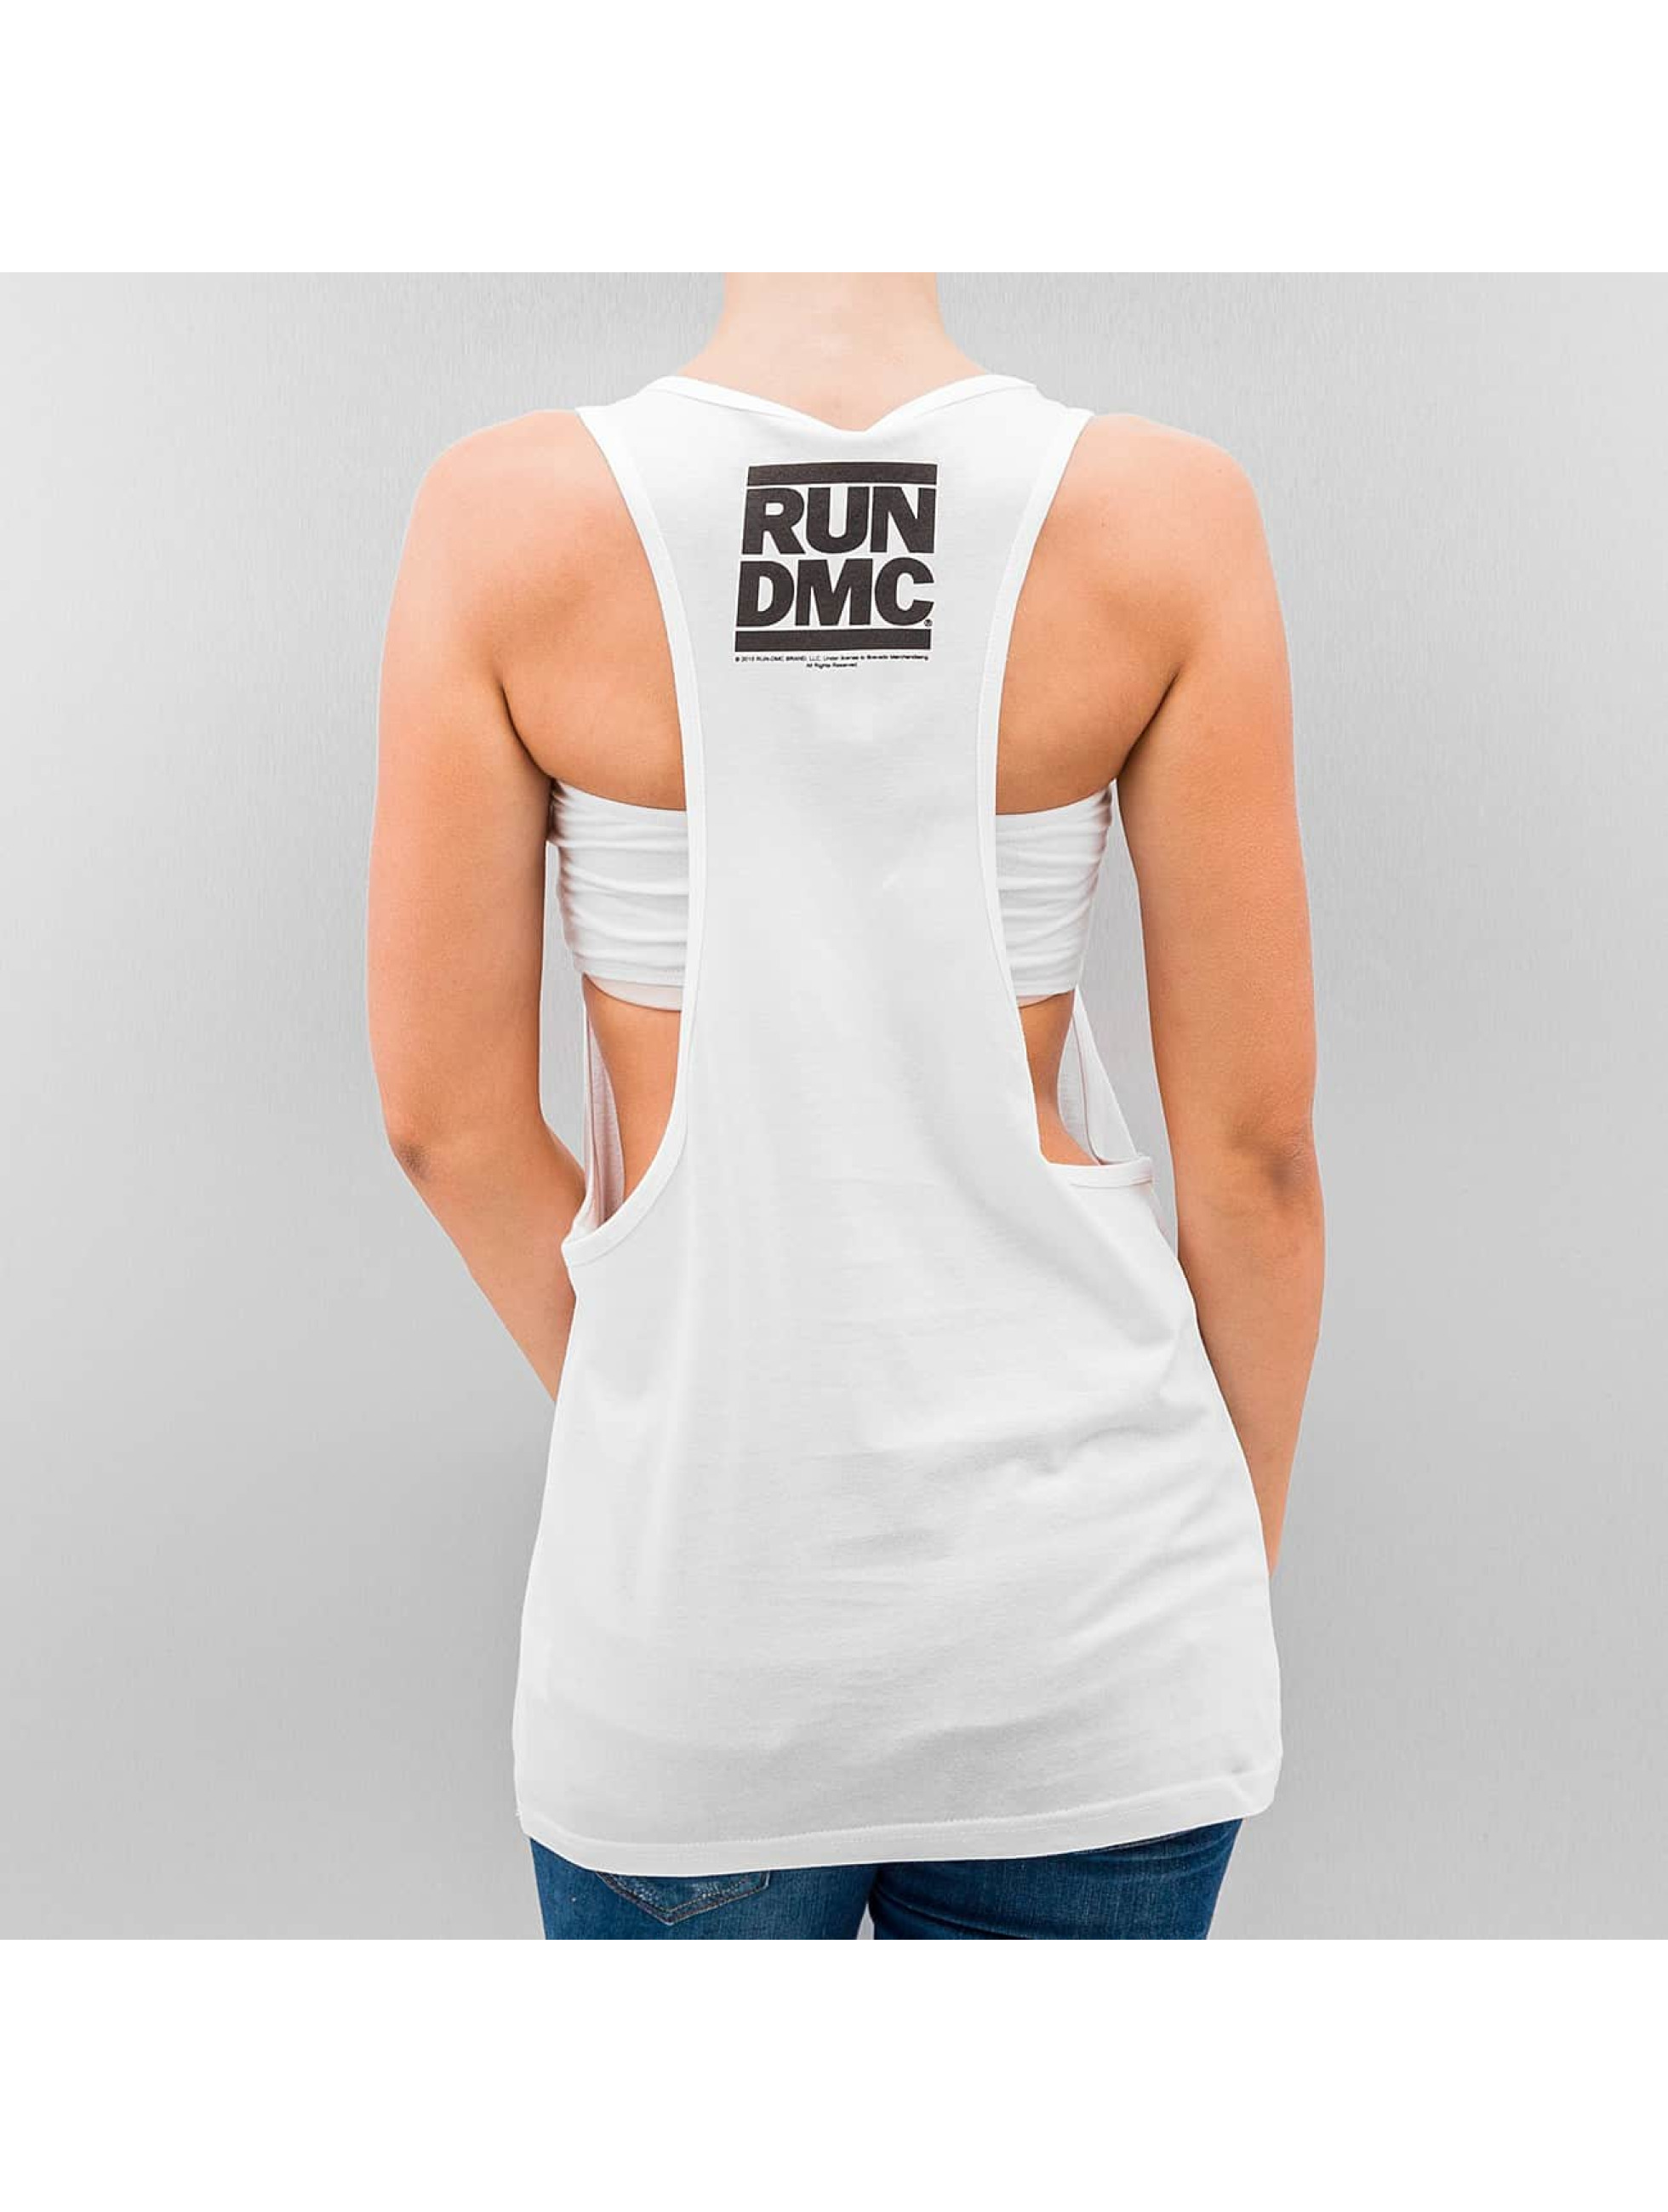 Mister Tee Tank Tops un DMC Logo белый